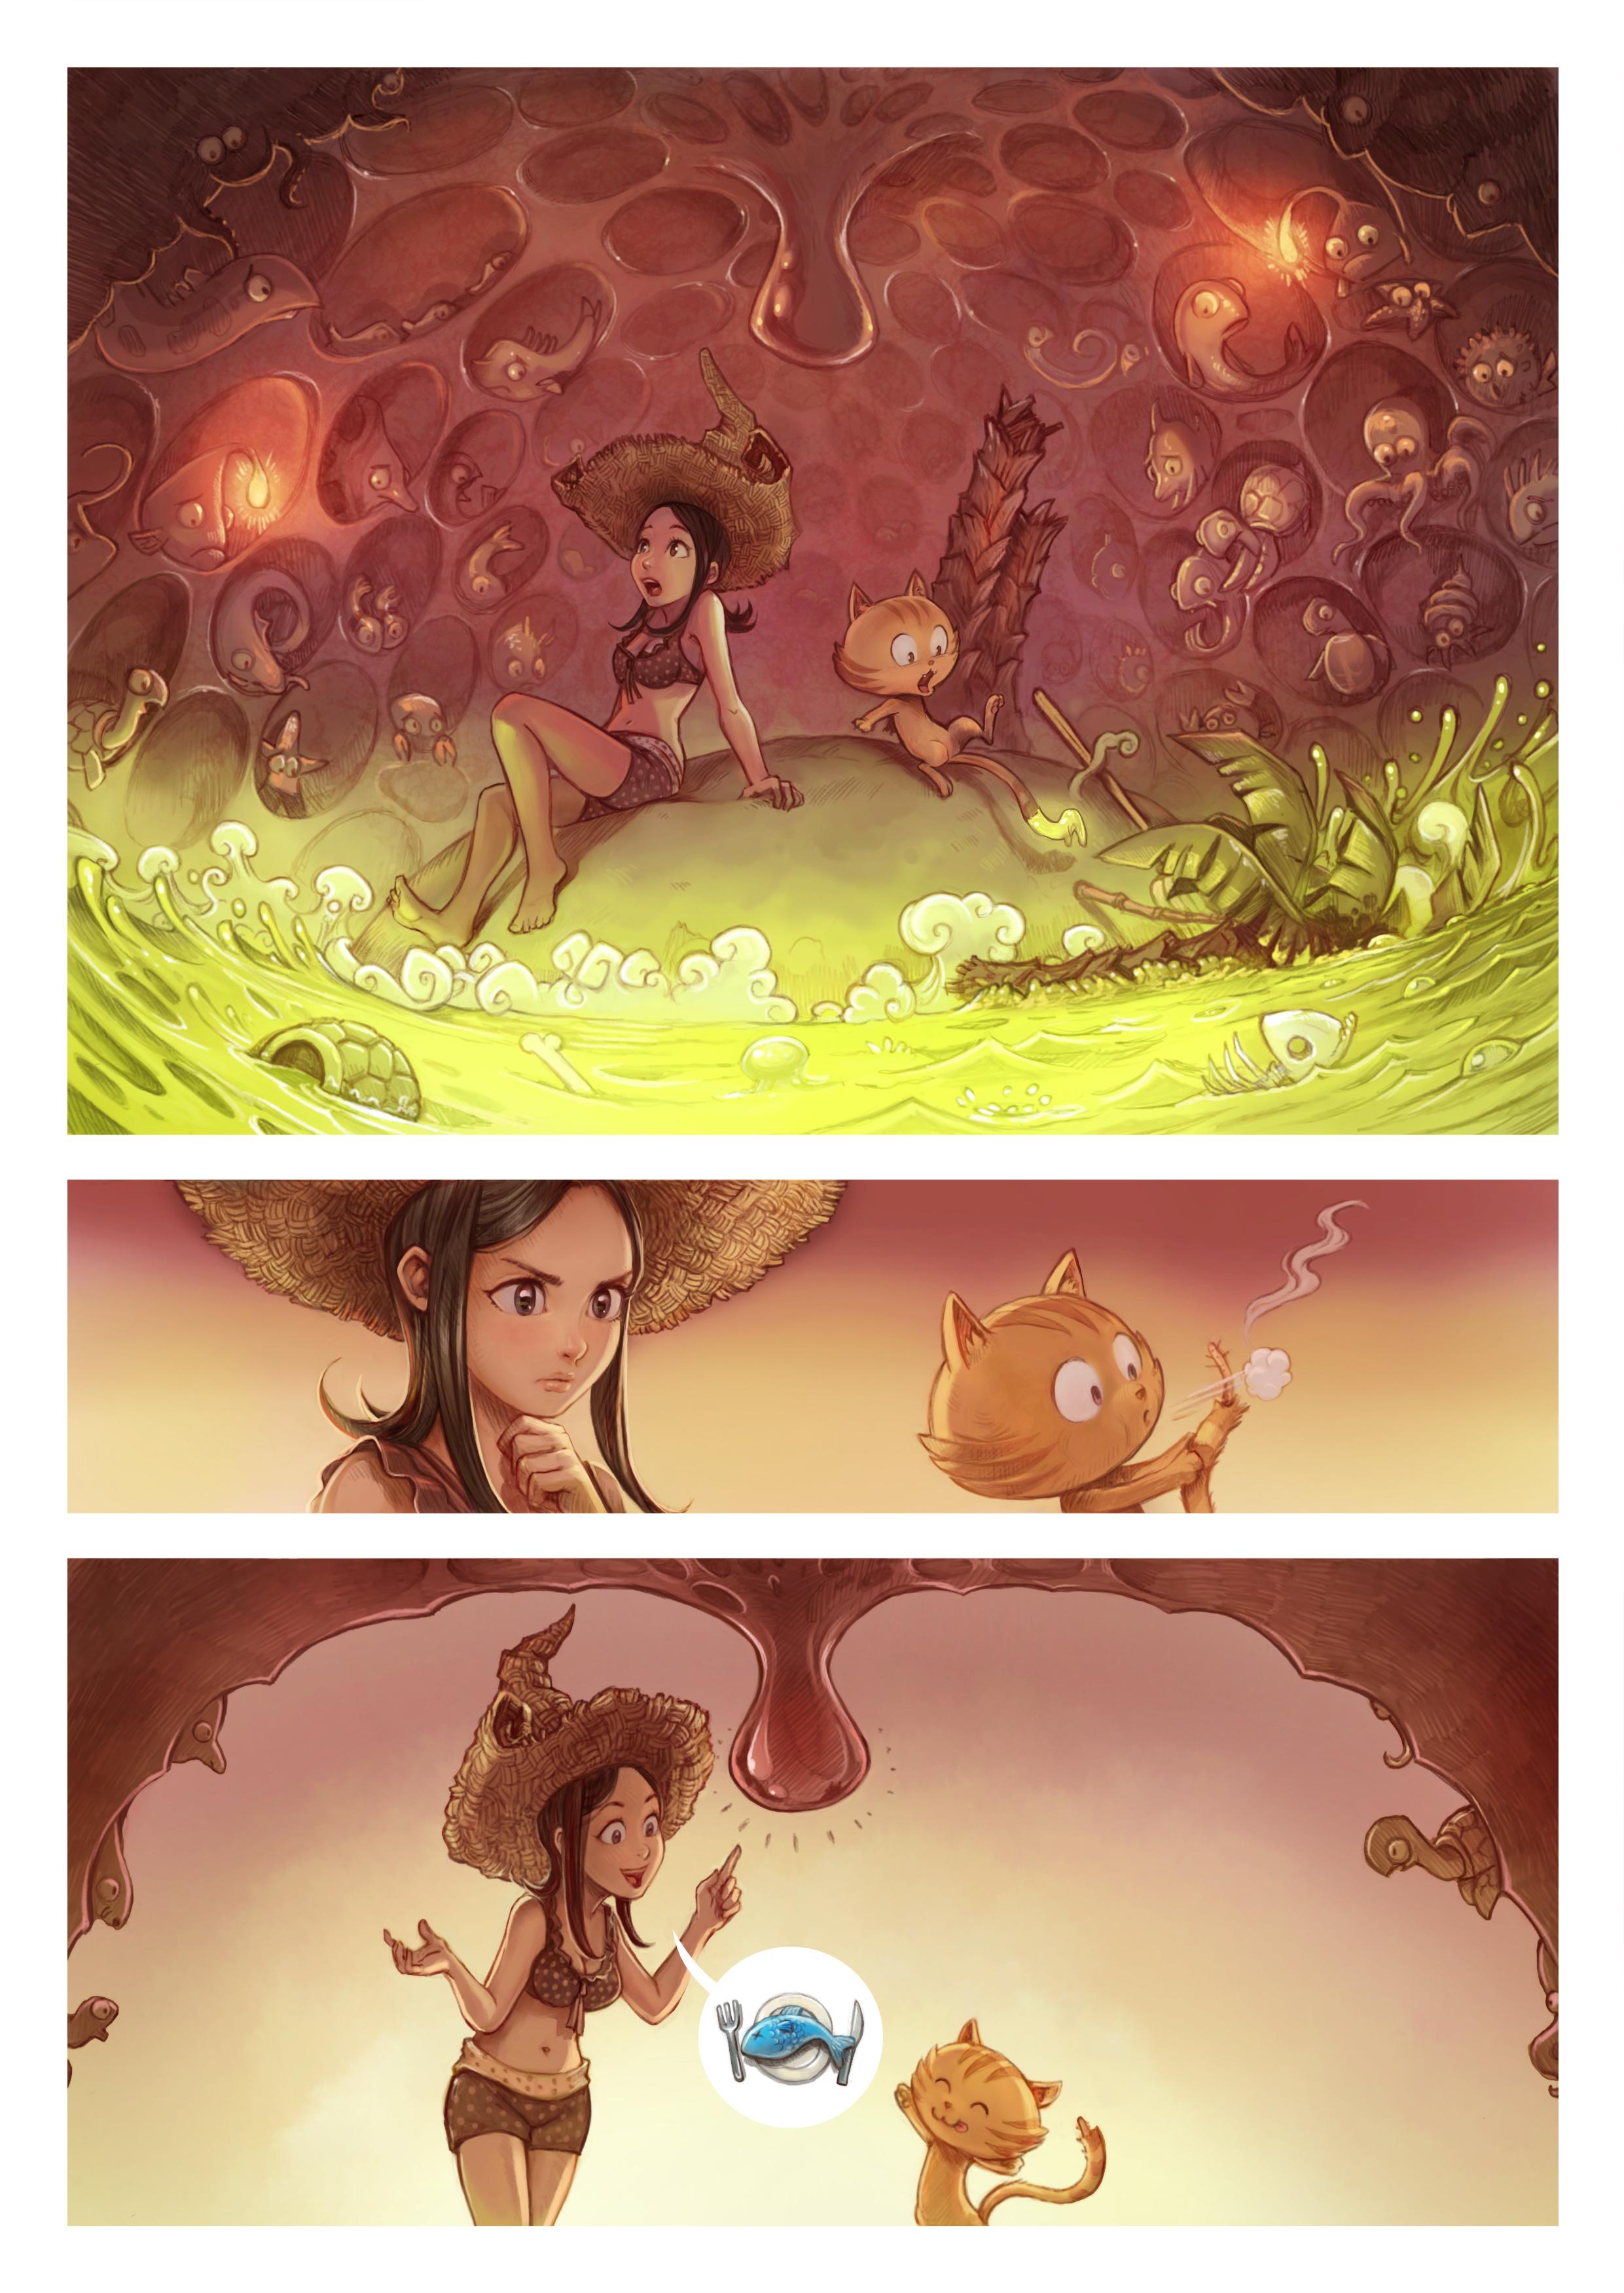 第10集:夏日特辑, Page 3